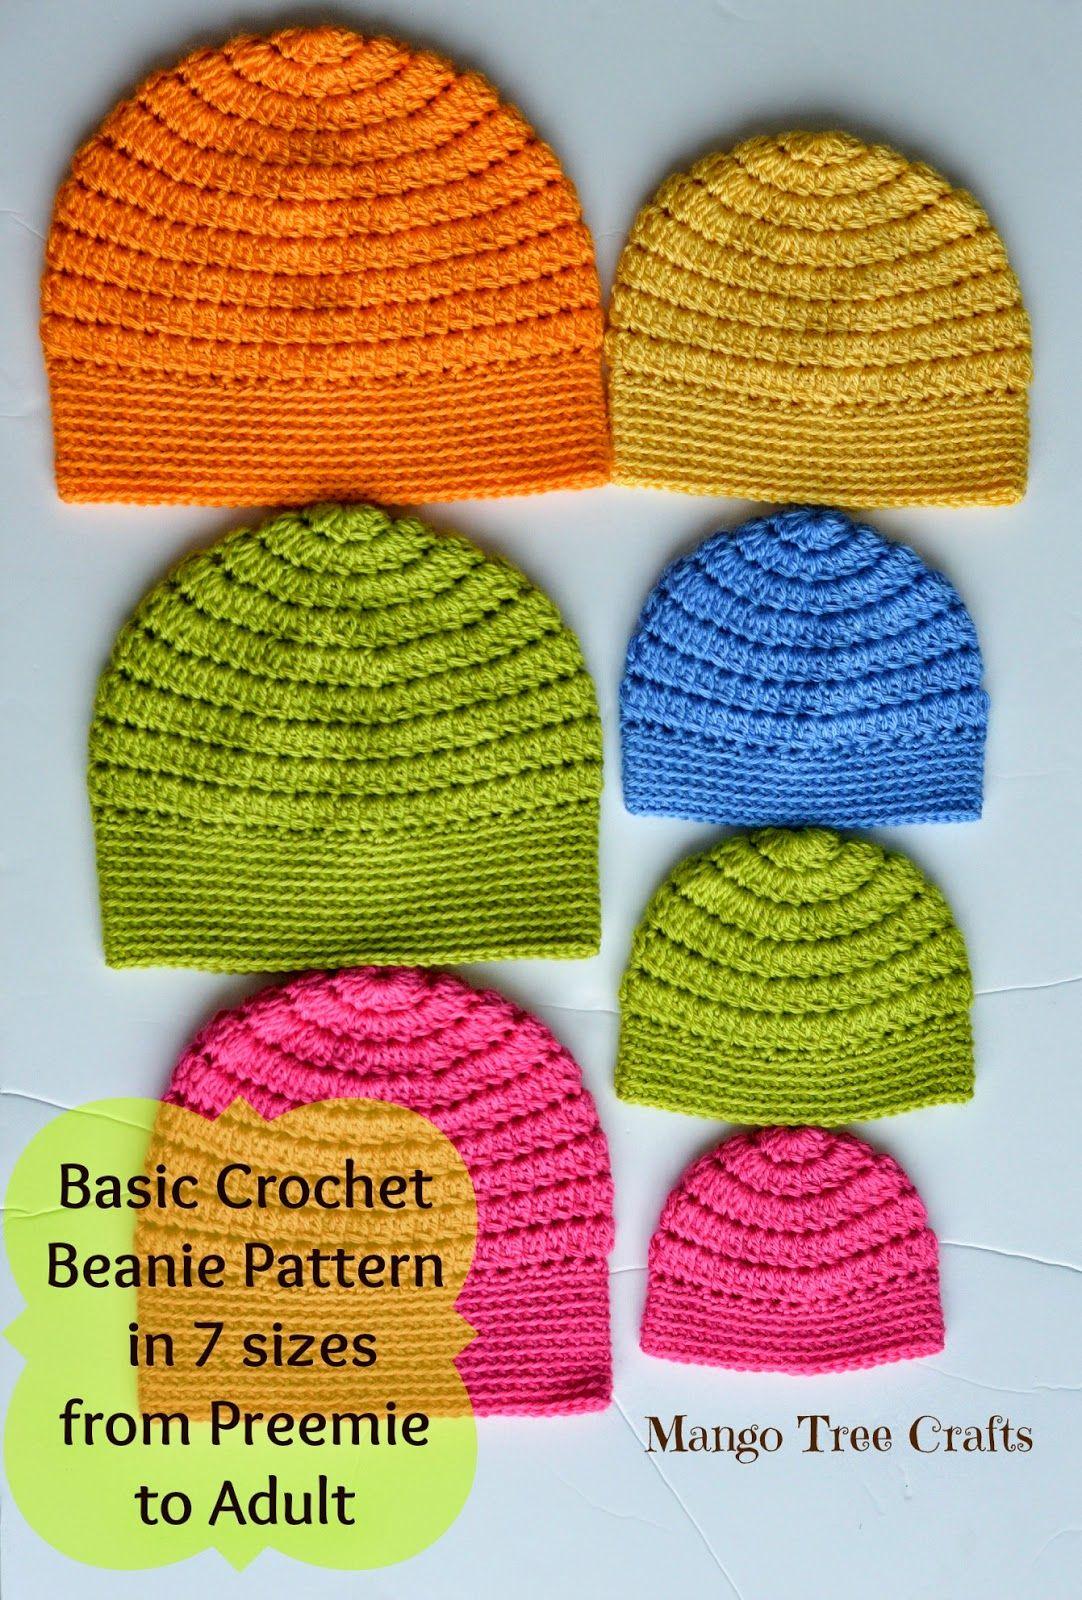 Mango Tree Crafts  Free Basic Beanie Crochet Pattern All Sizes ... f5be1590ab